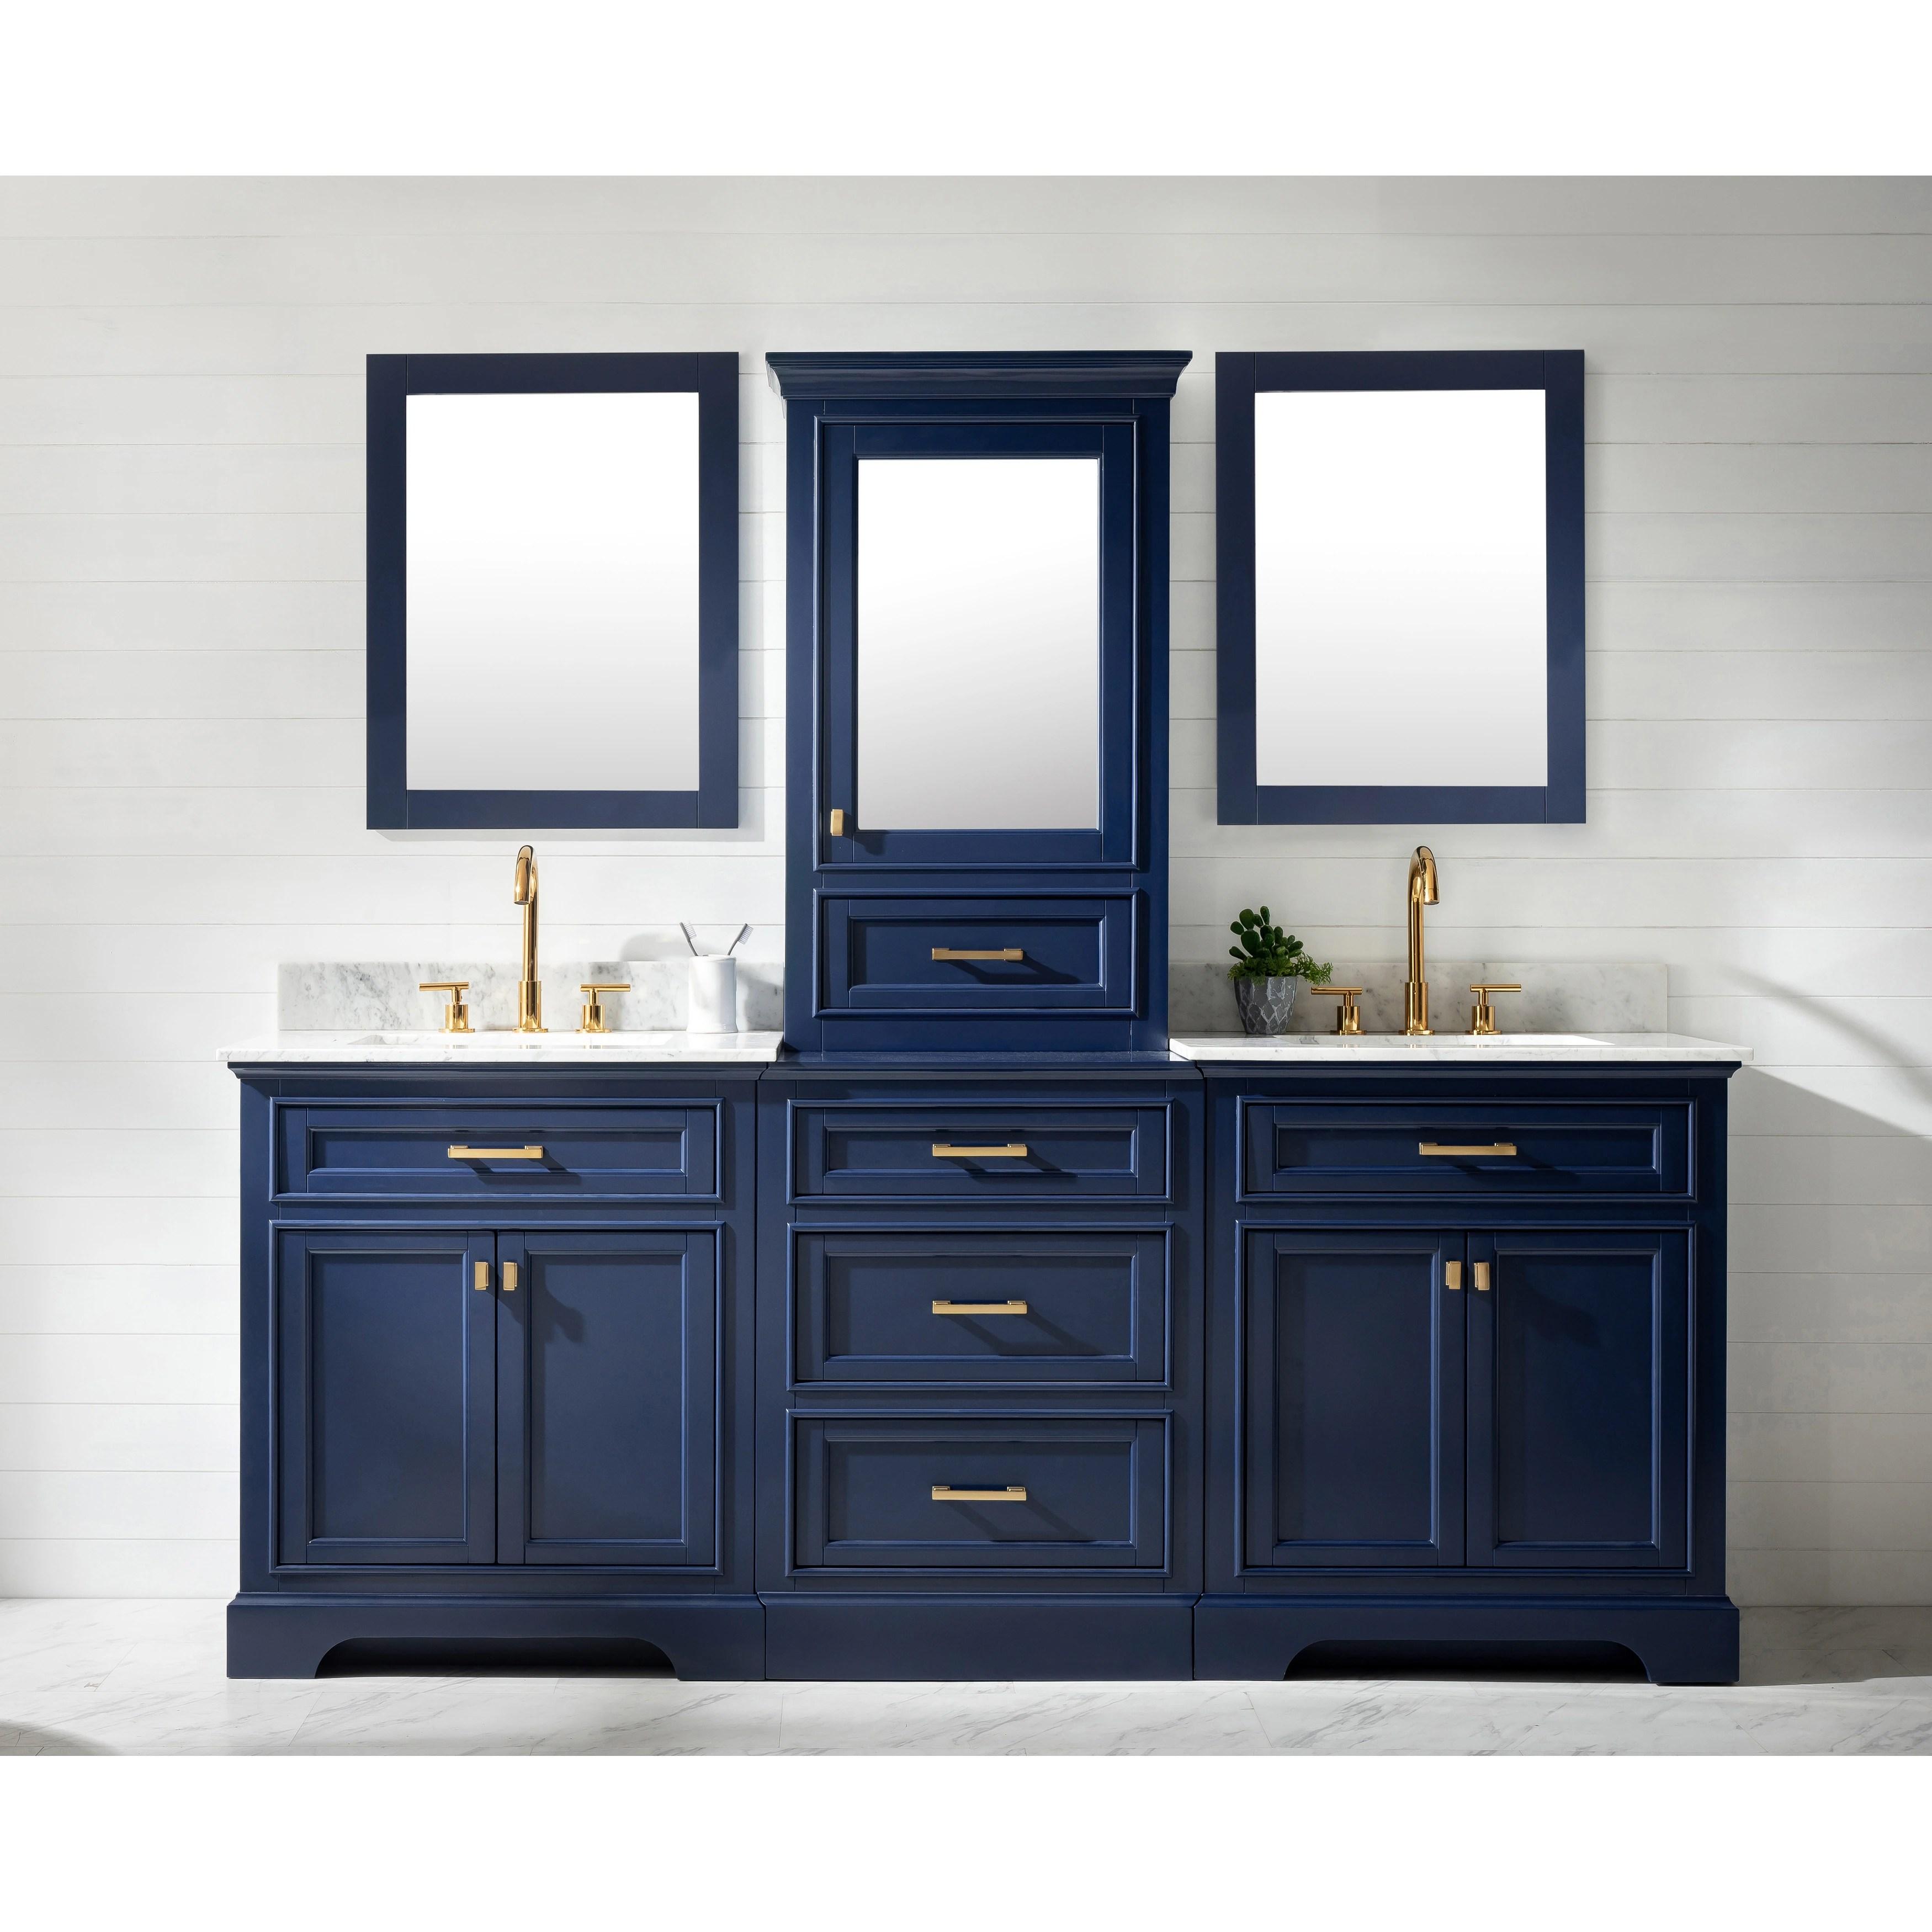 milano 84 double sink bathroom vanity modular set in blue